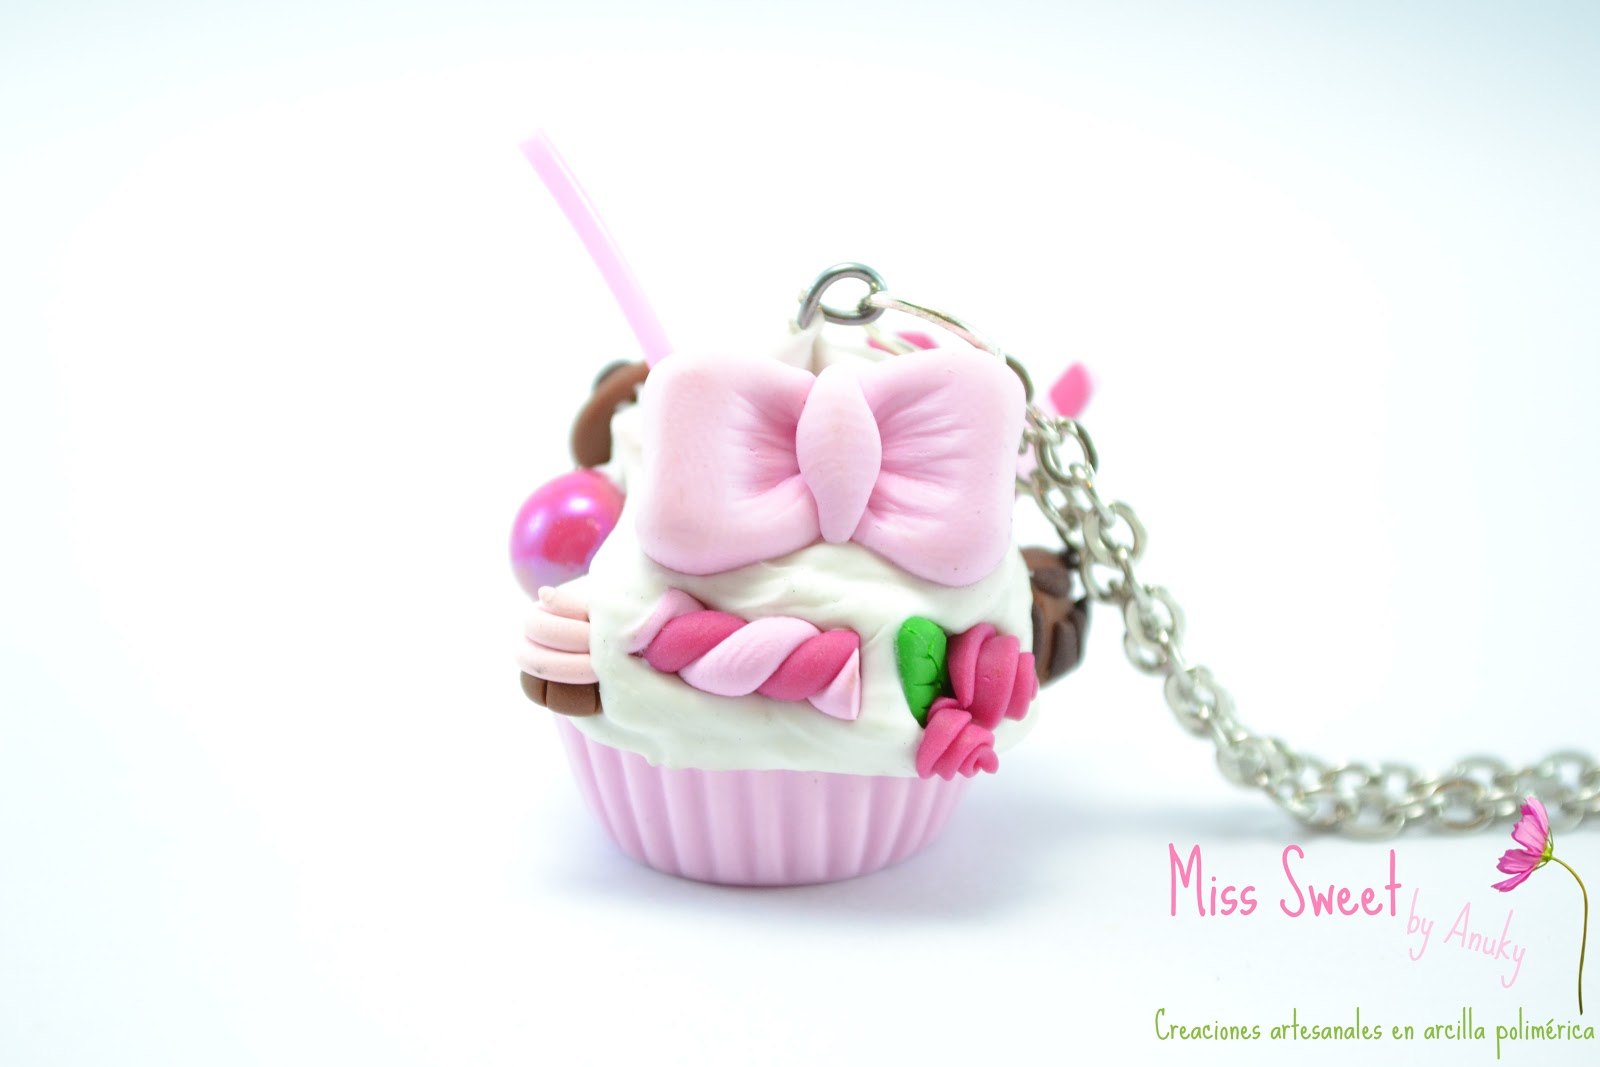 Conociendo_a_Miss_Sweet_The_Pink_Graff_01